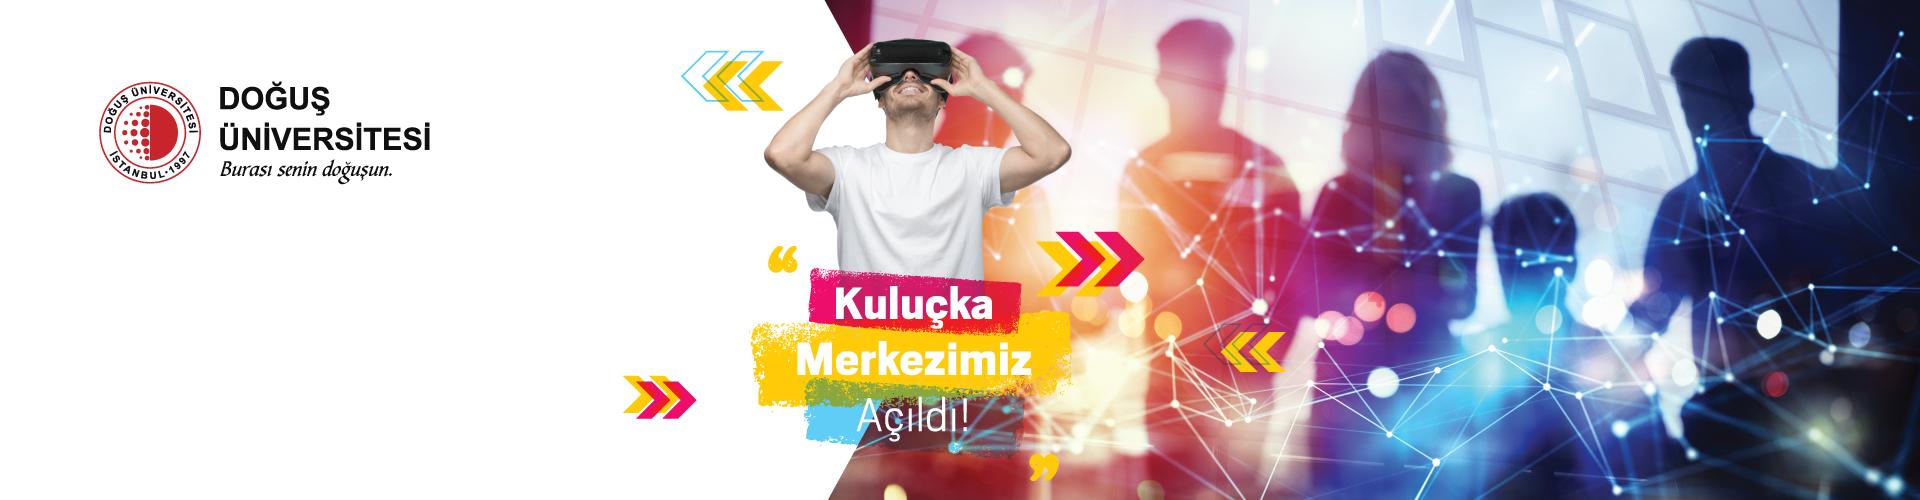 Kuluçka_Merkezi_Aday_Web_Slider_pc